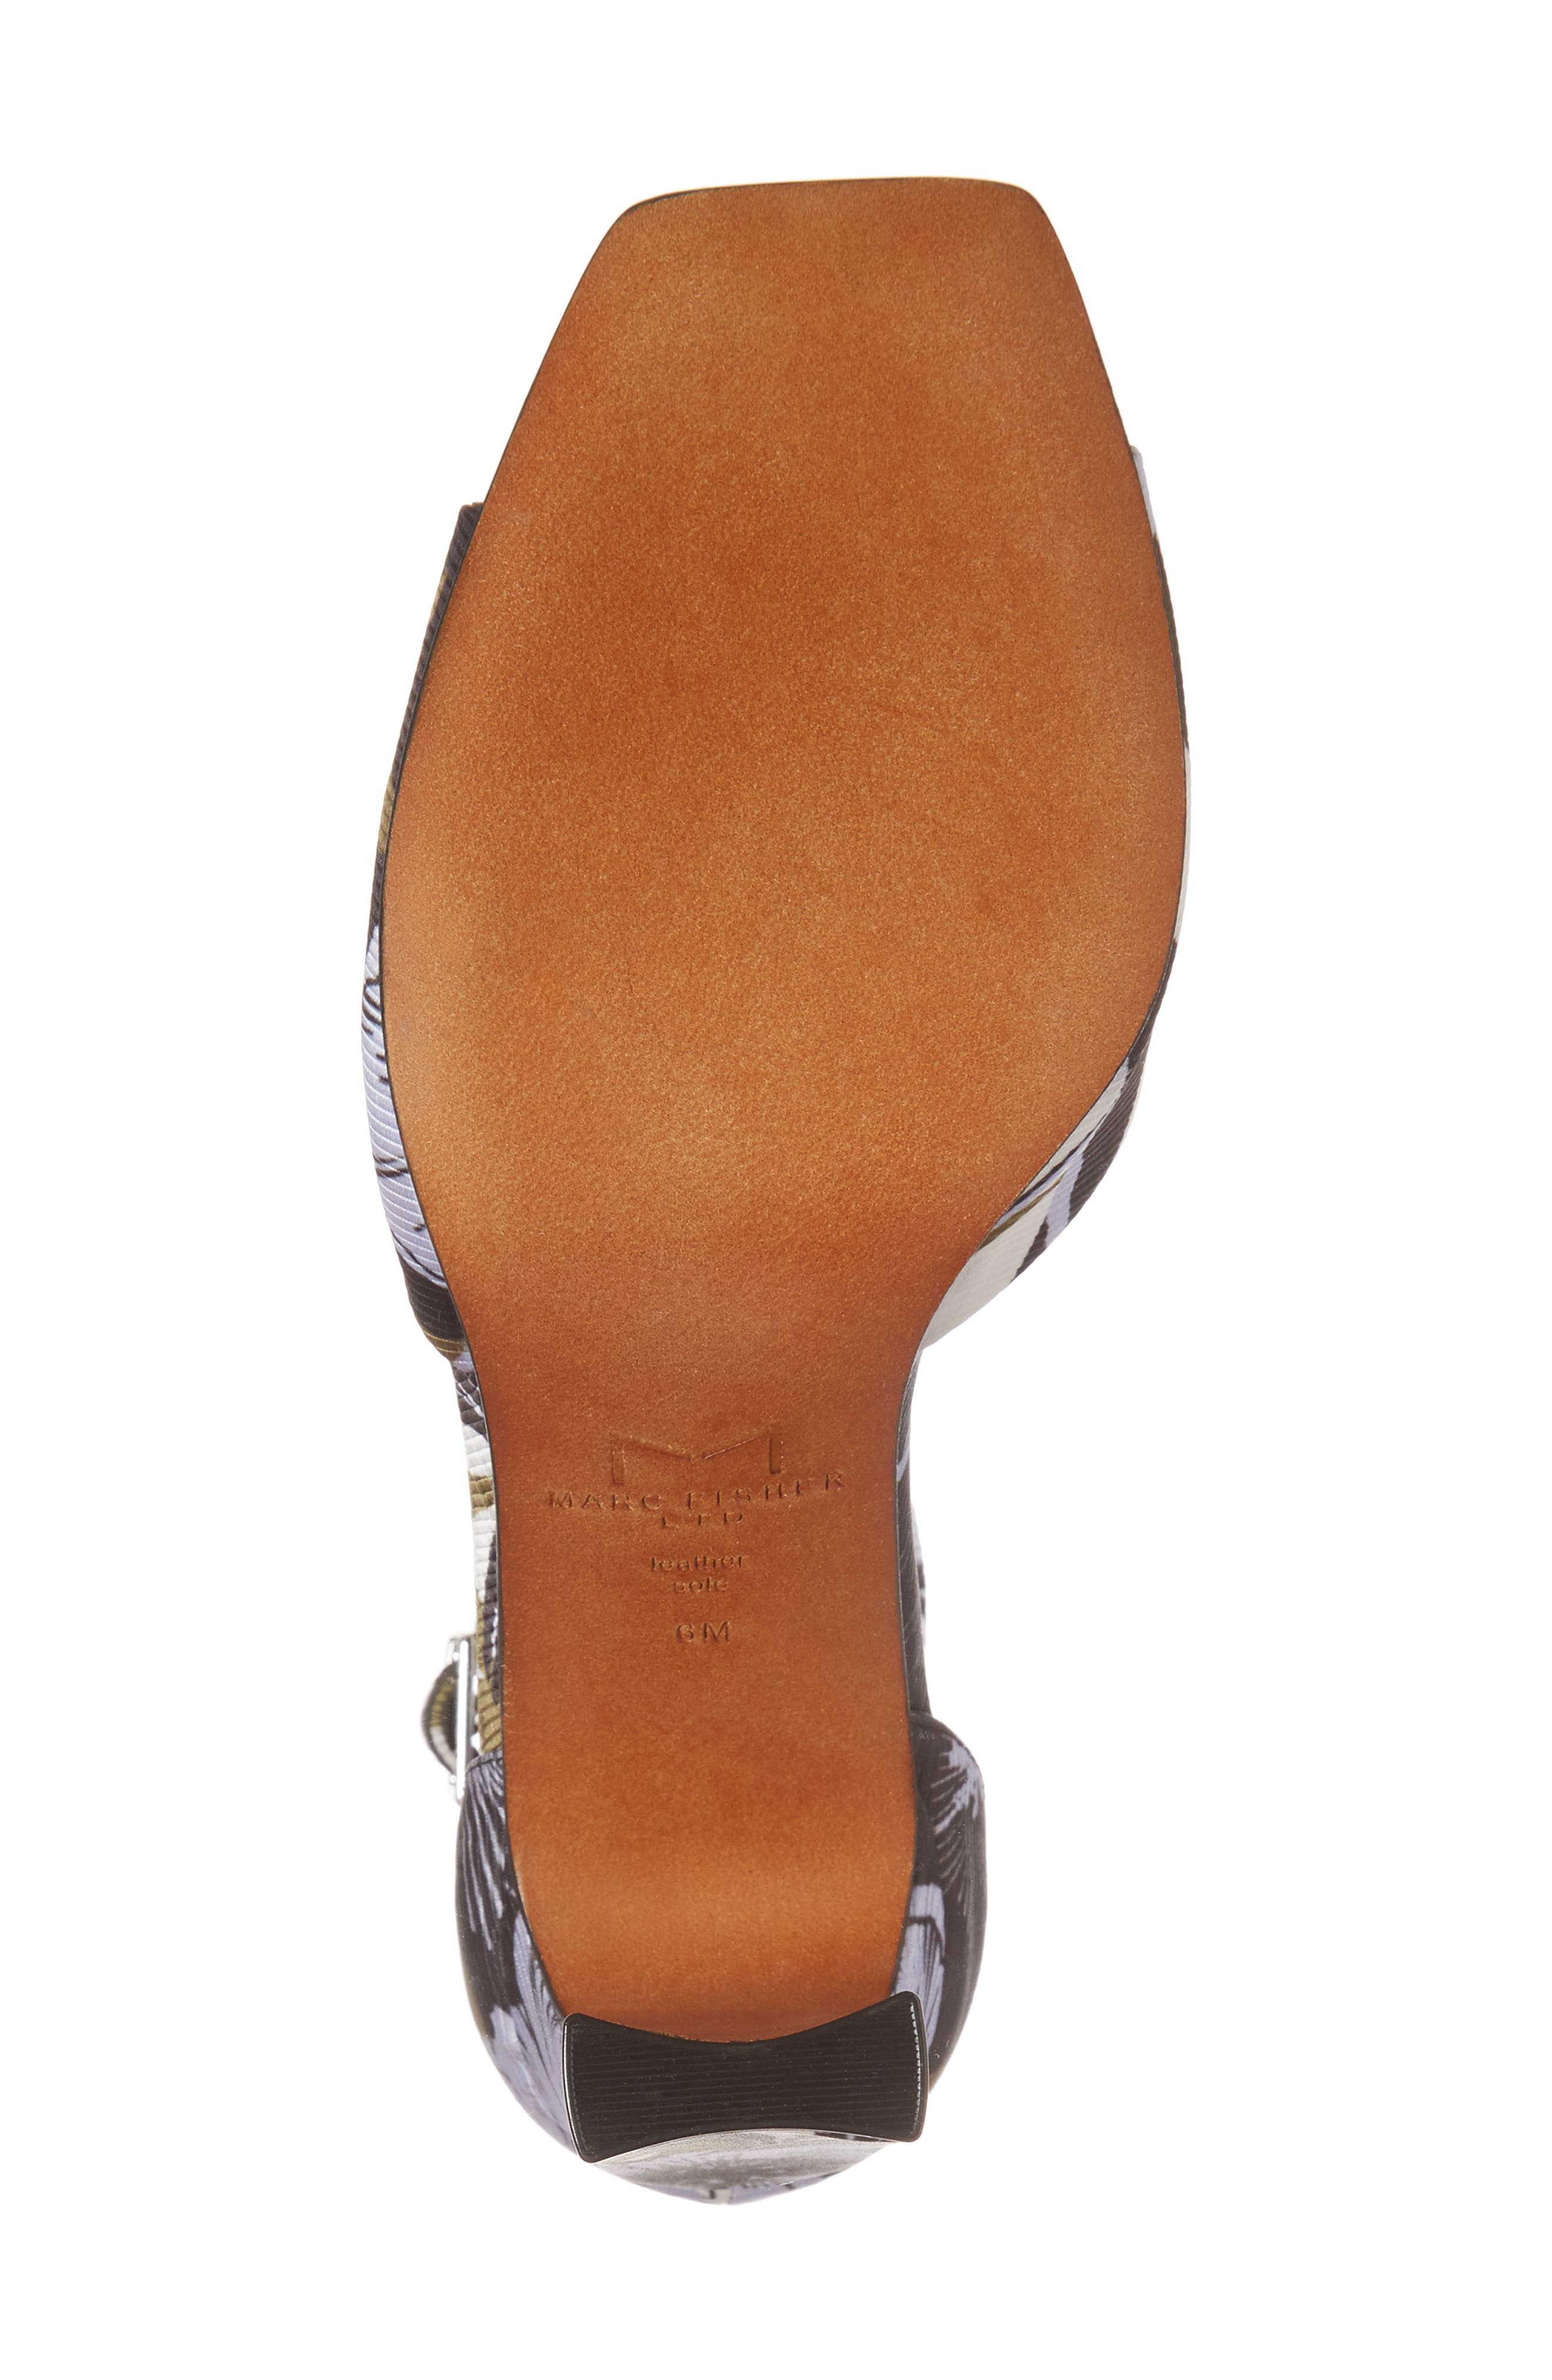 Harlin Ankle Strap Sandal,                             Alternate thumbnail 6, color,                             Jungle Print Fabric